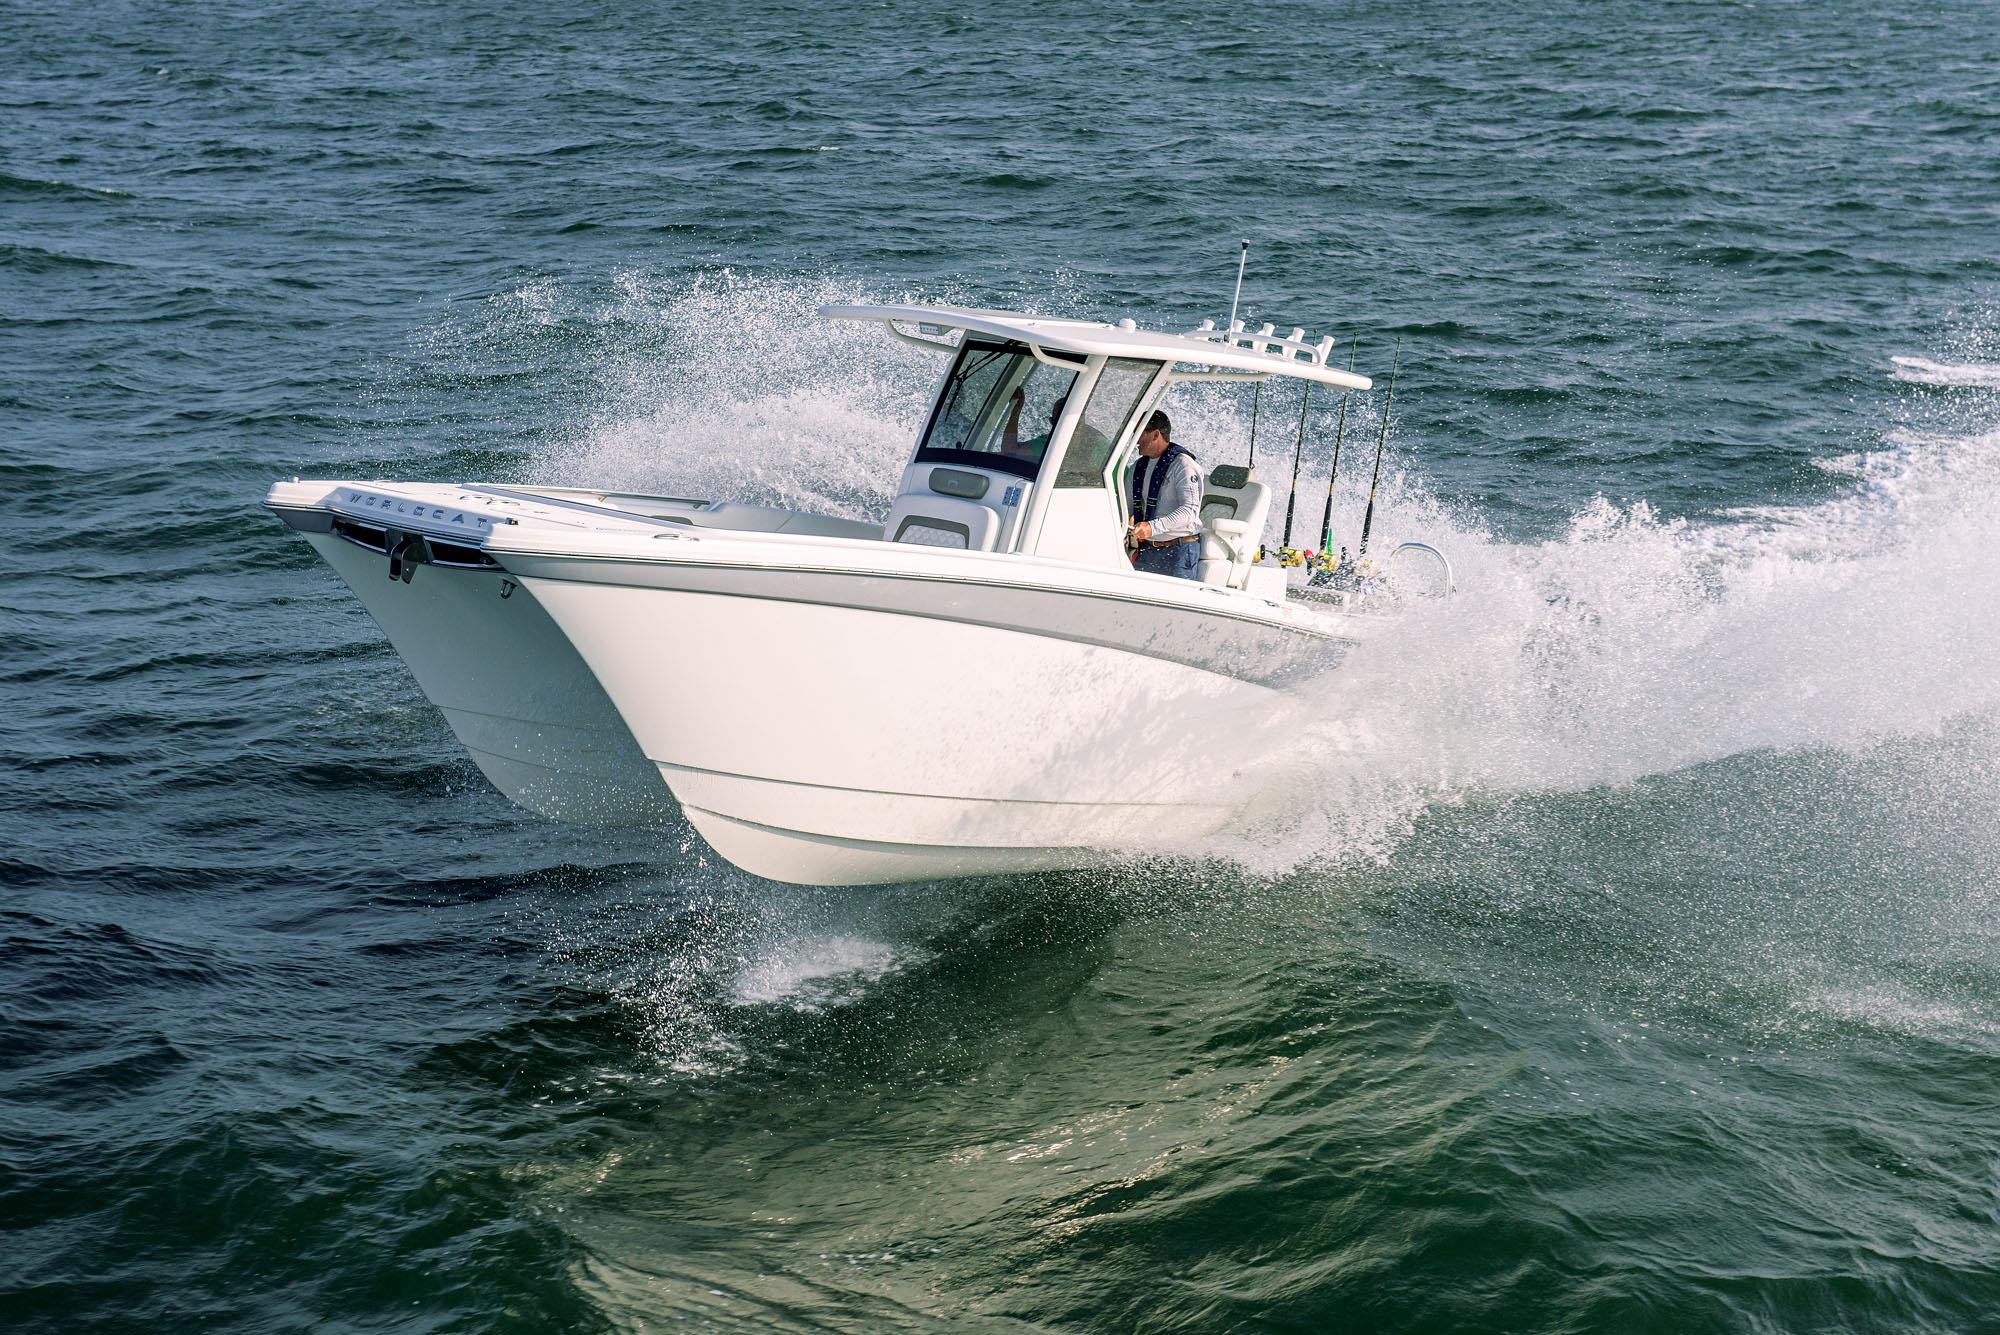 Multihull Catamaran Boats Invade The Offshore Fishing Market Sport Fishing Magazine